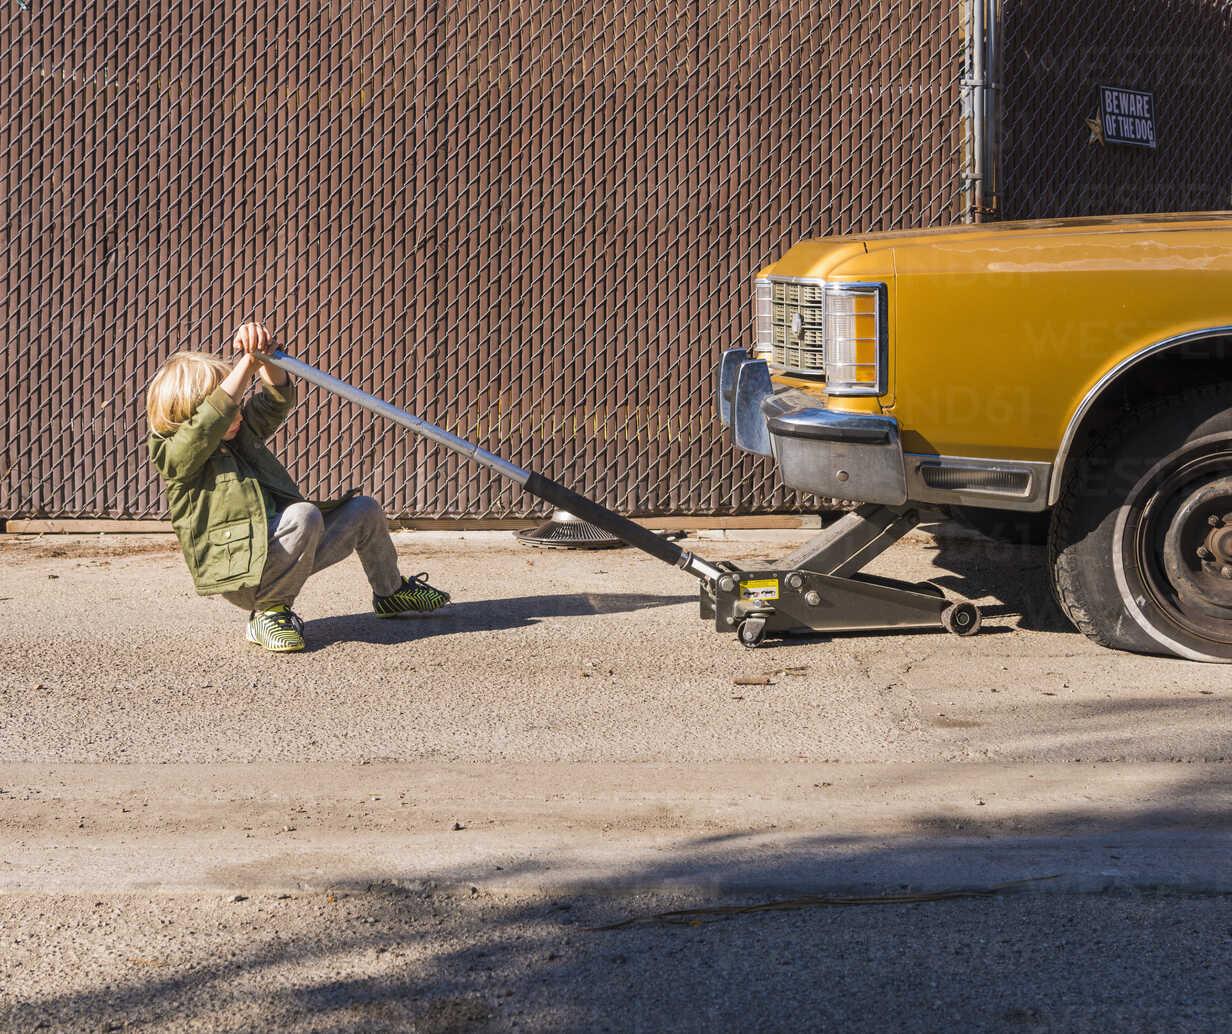 Boy using car jack to raise car - ISF06719 - JLPH/Westend61